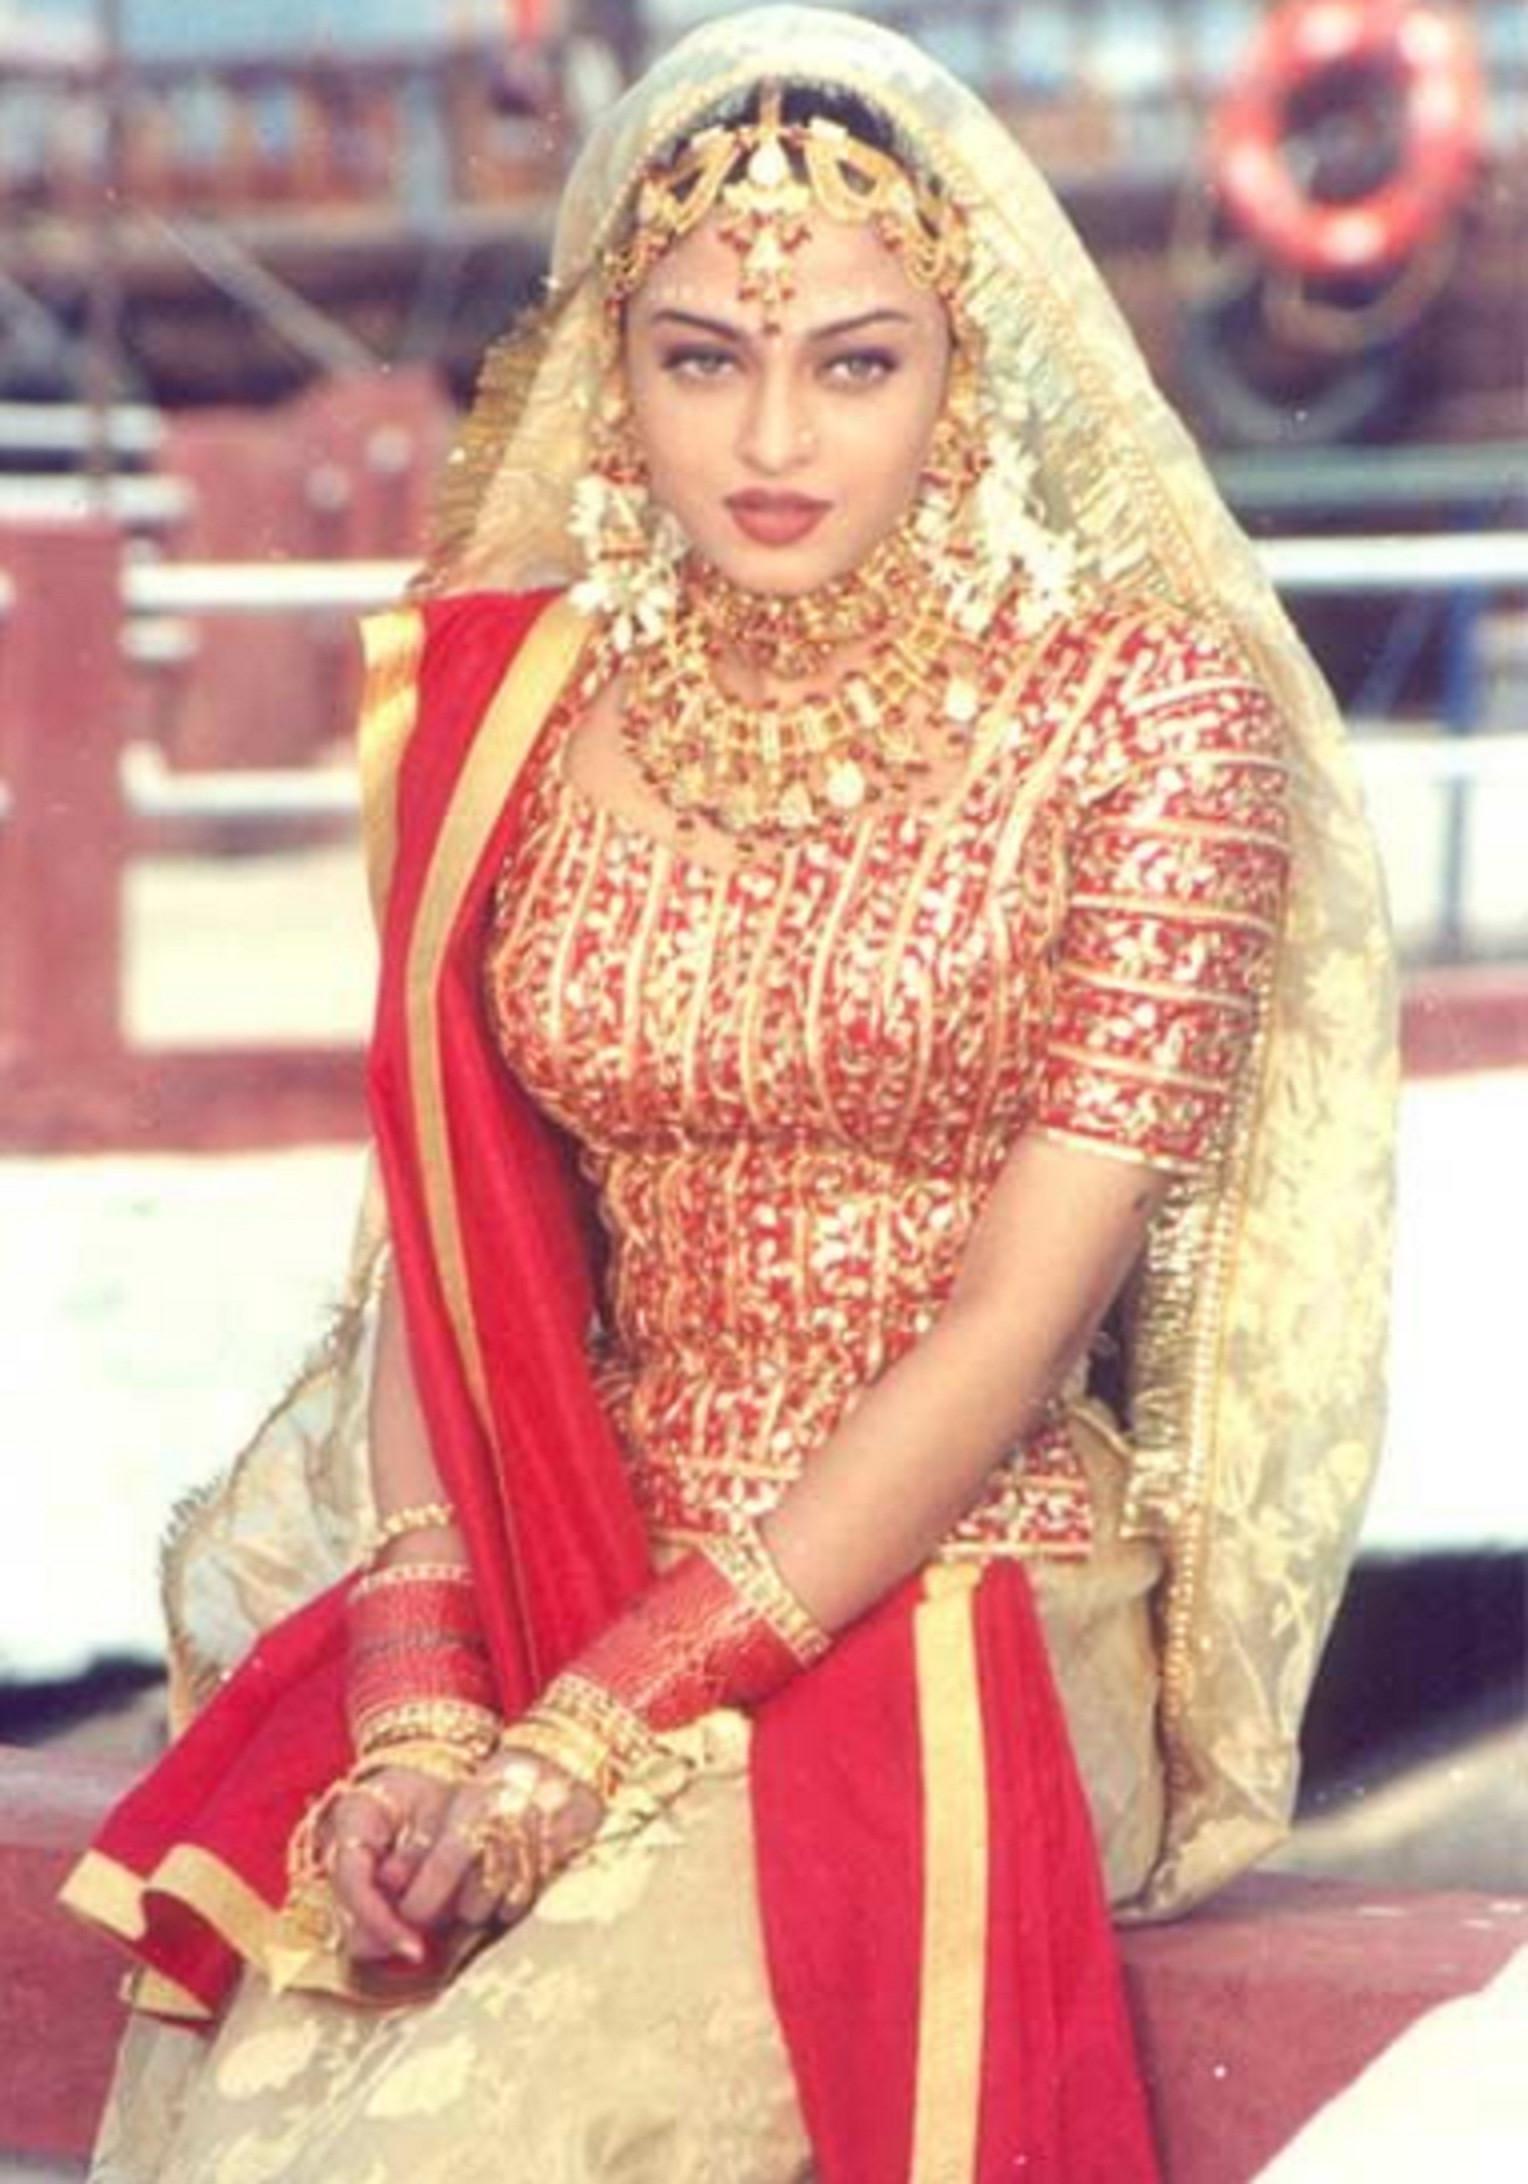 Aishwarya Rai di hari pernikahannya dengan Abhishek Bachchan pada 2007 silam (The Huffington Post)